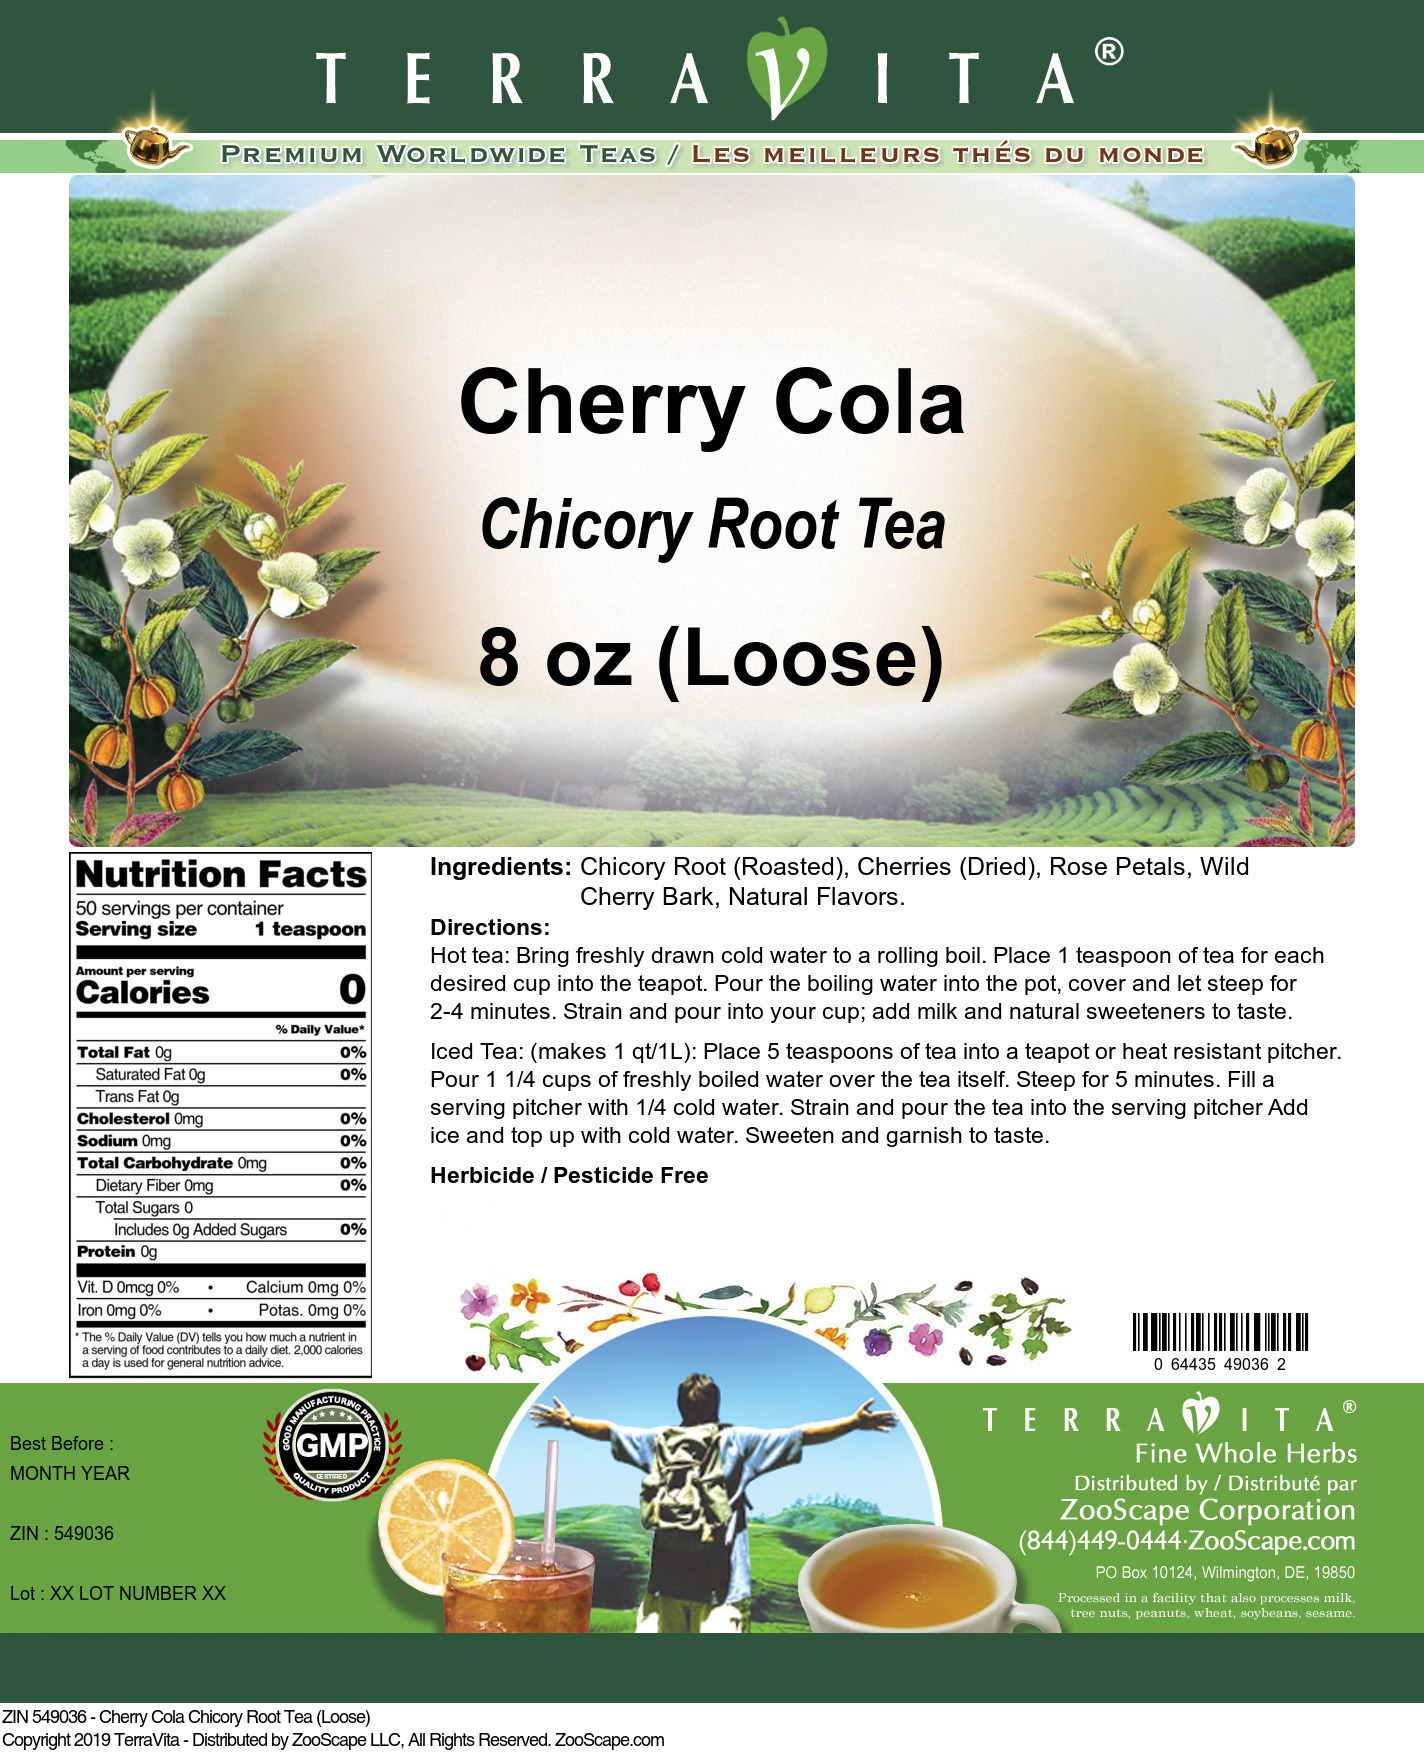 Cherry Cola Chicory Root Tea (Loose)